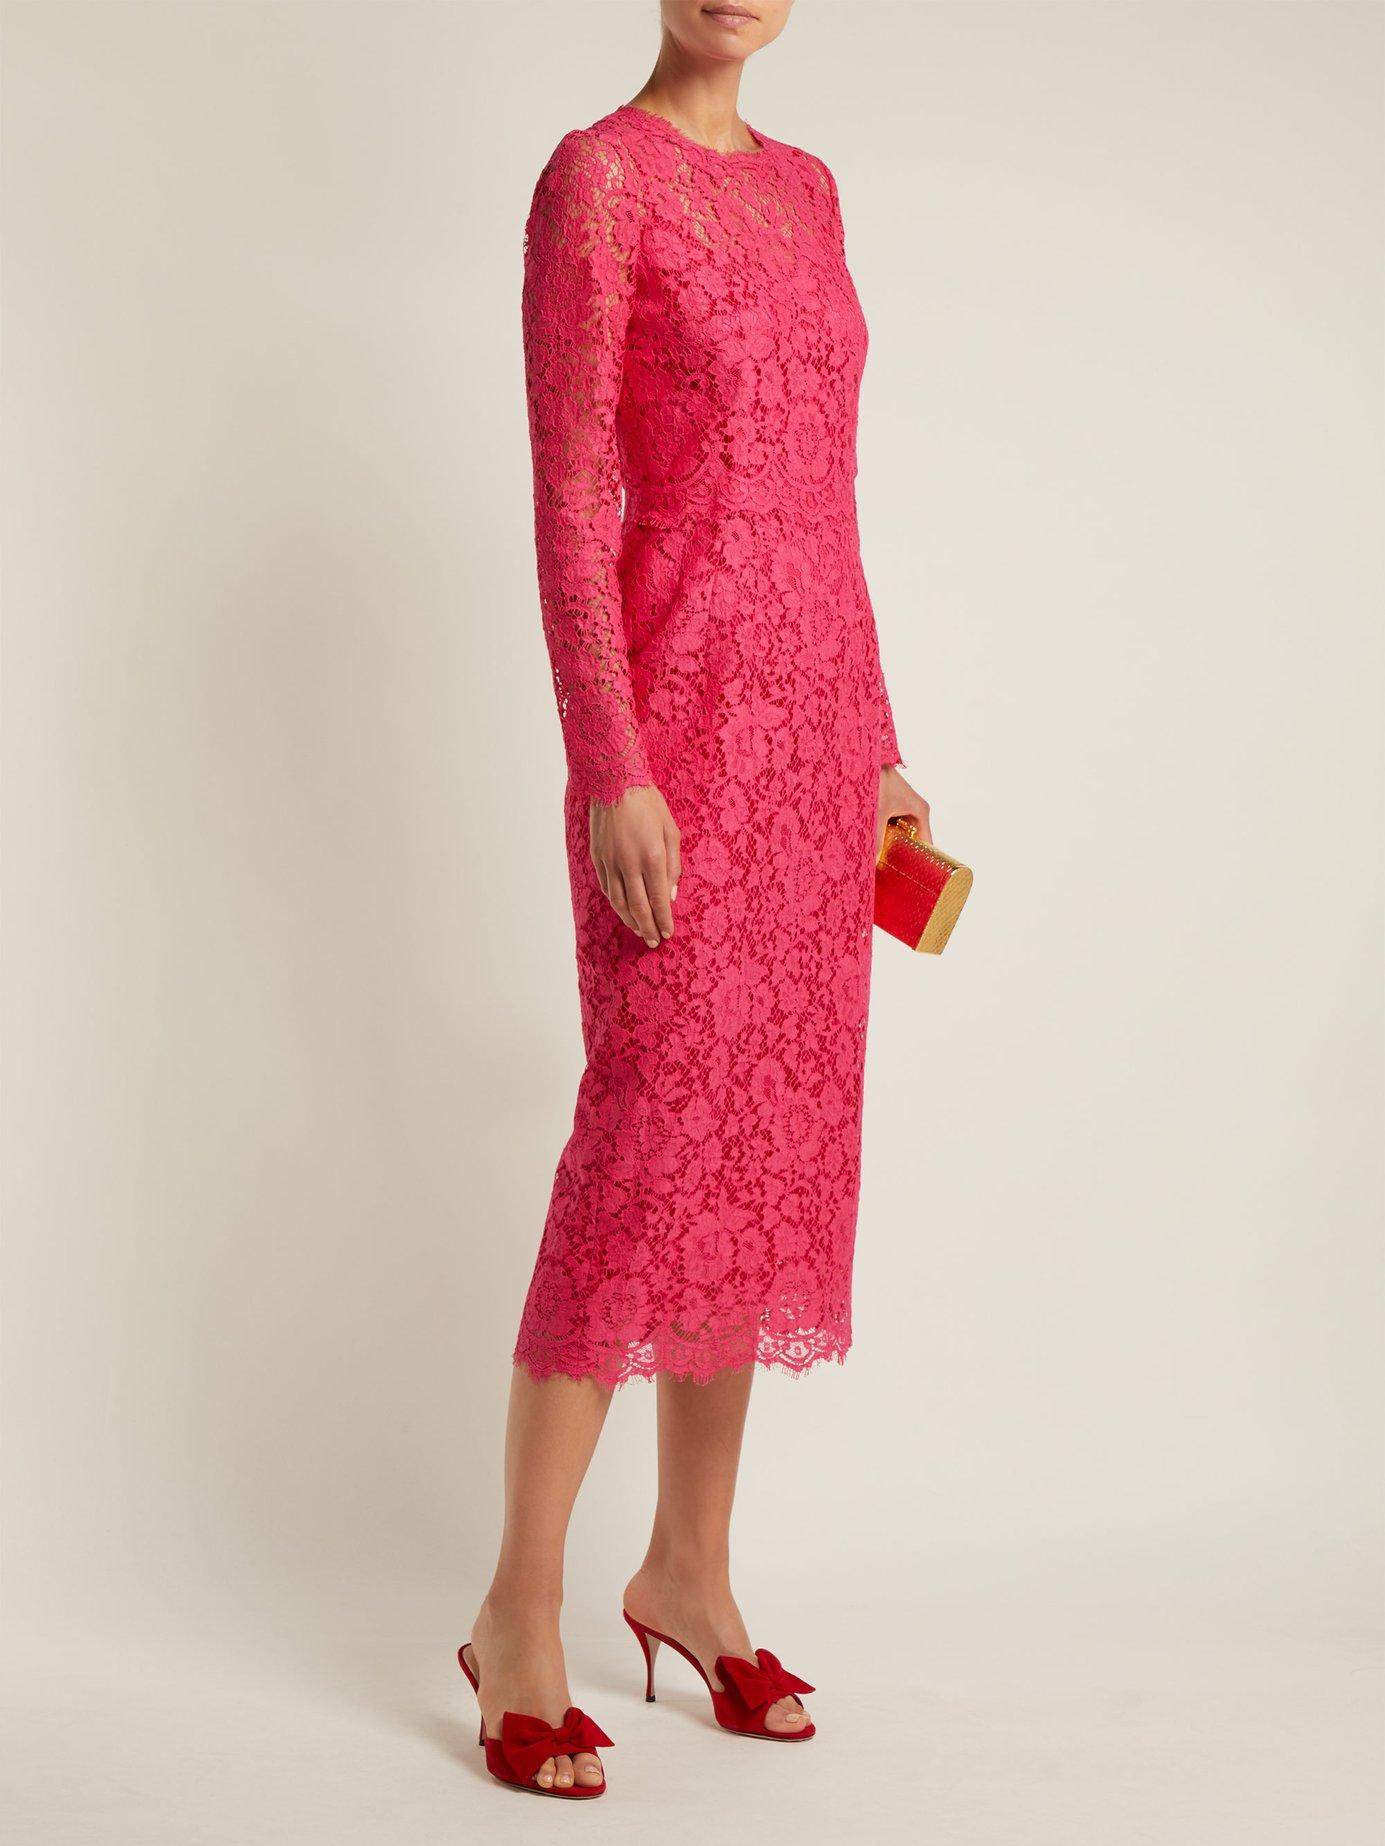 Cordonetto-lace midi dress by Dolce & Gabbana